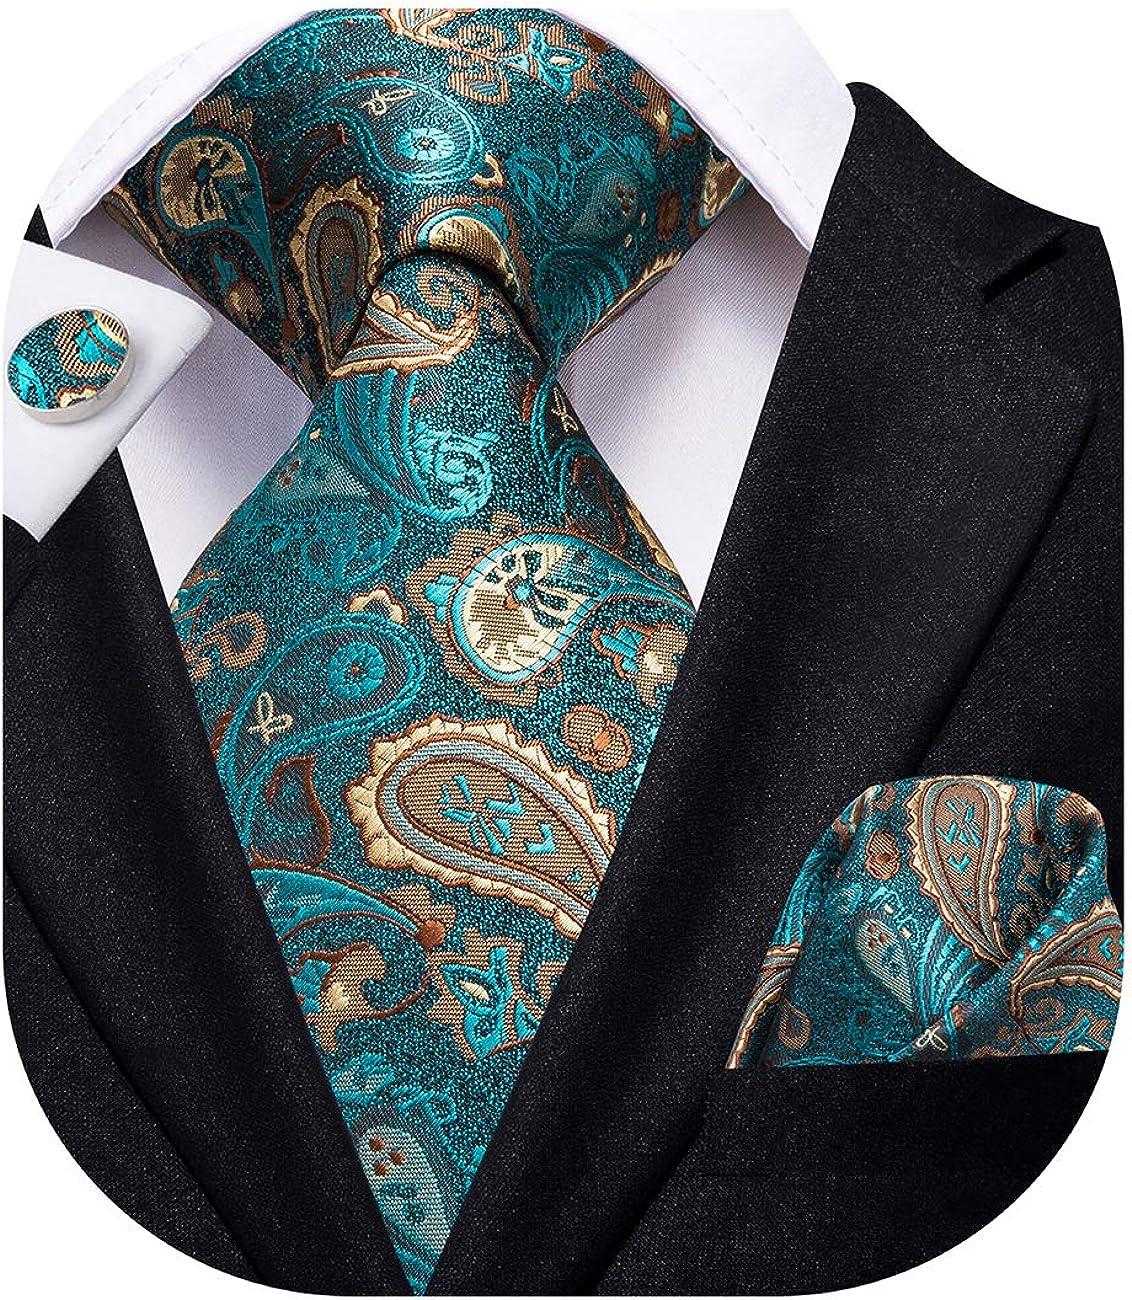 Hi-Tie Green Paisley Silk Tie for Wedding Mens Necktie with Pocket Square